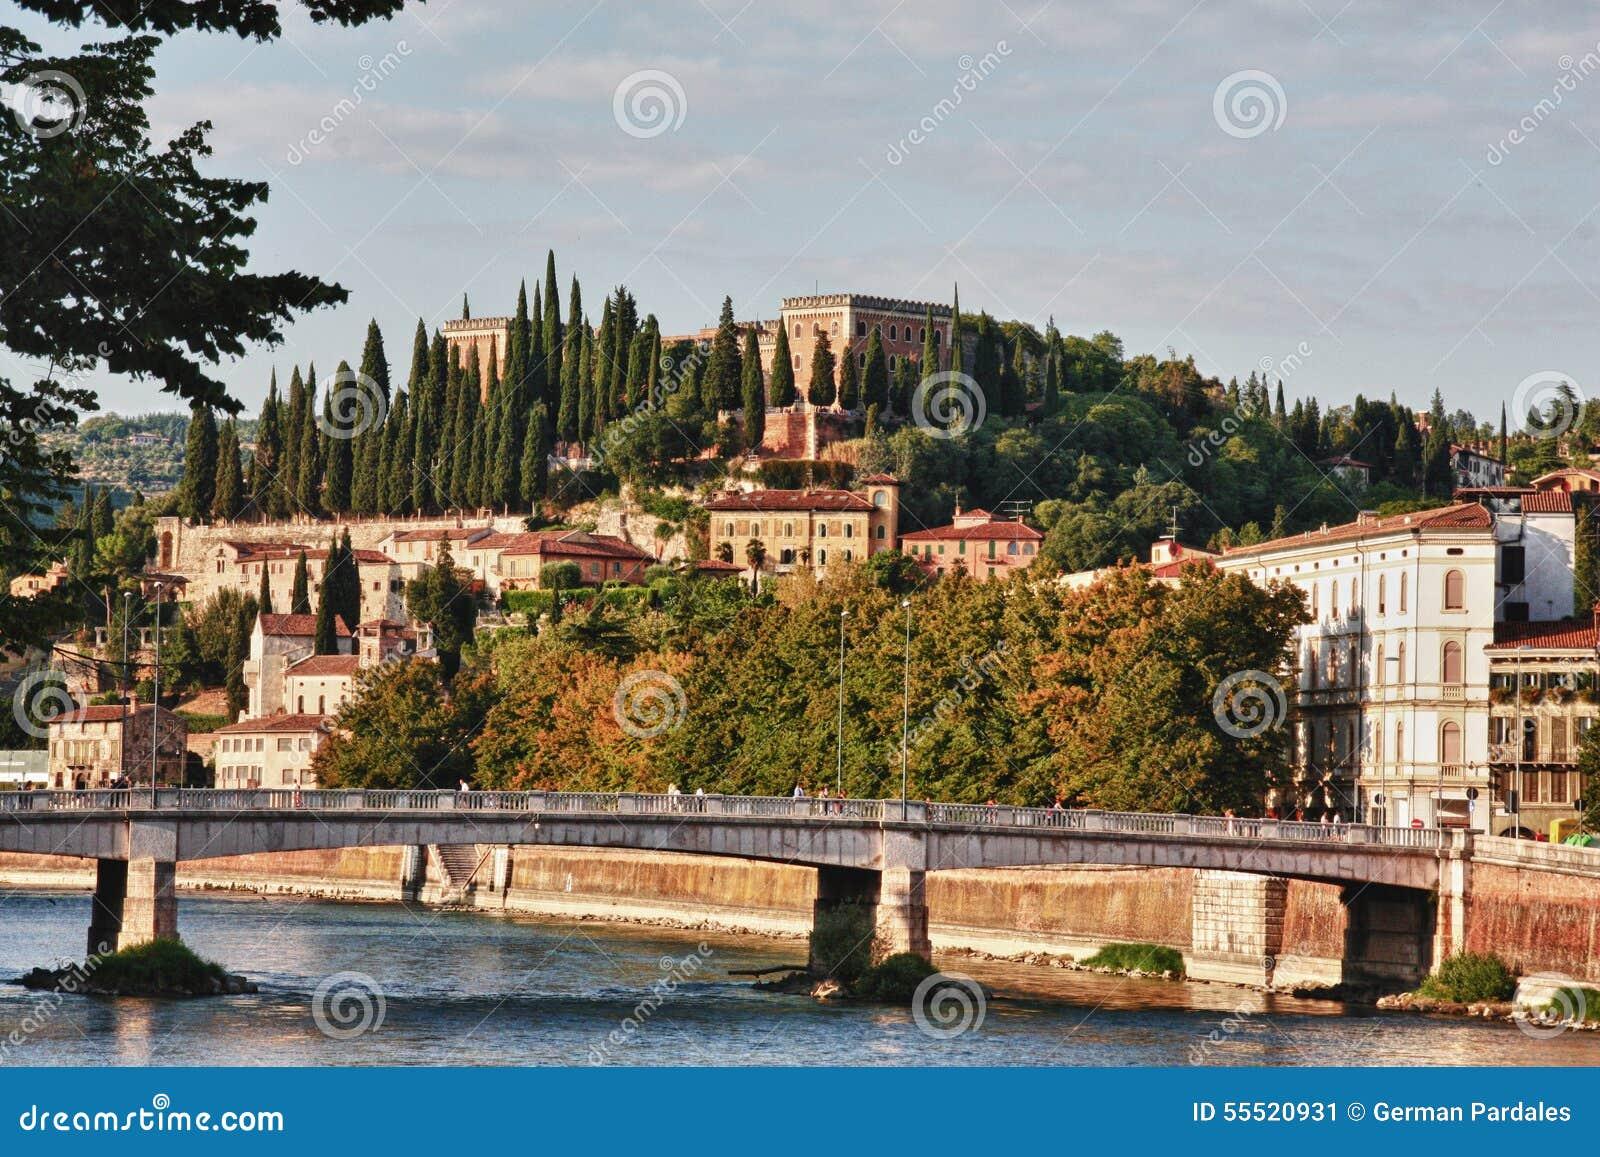 Taken in verona the city of romeo and julieta amazing city to visit